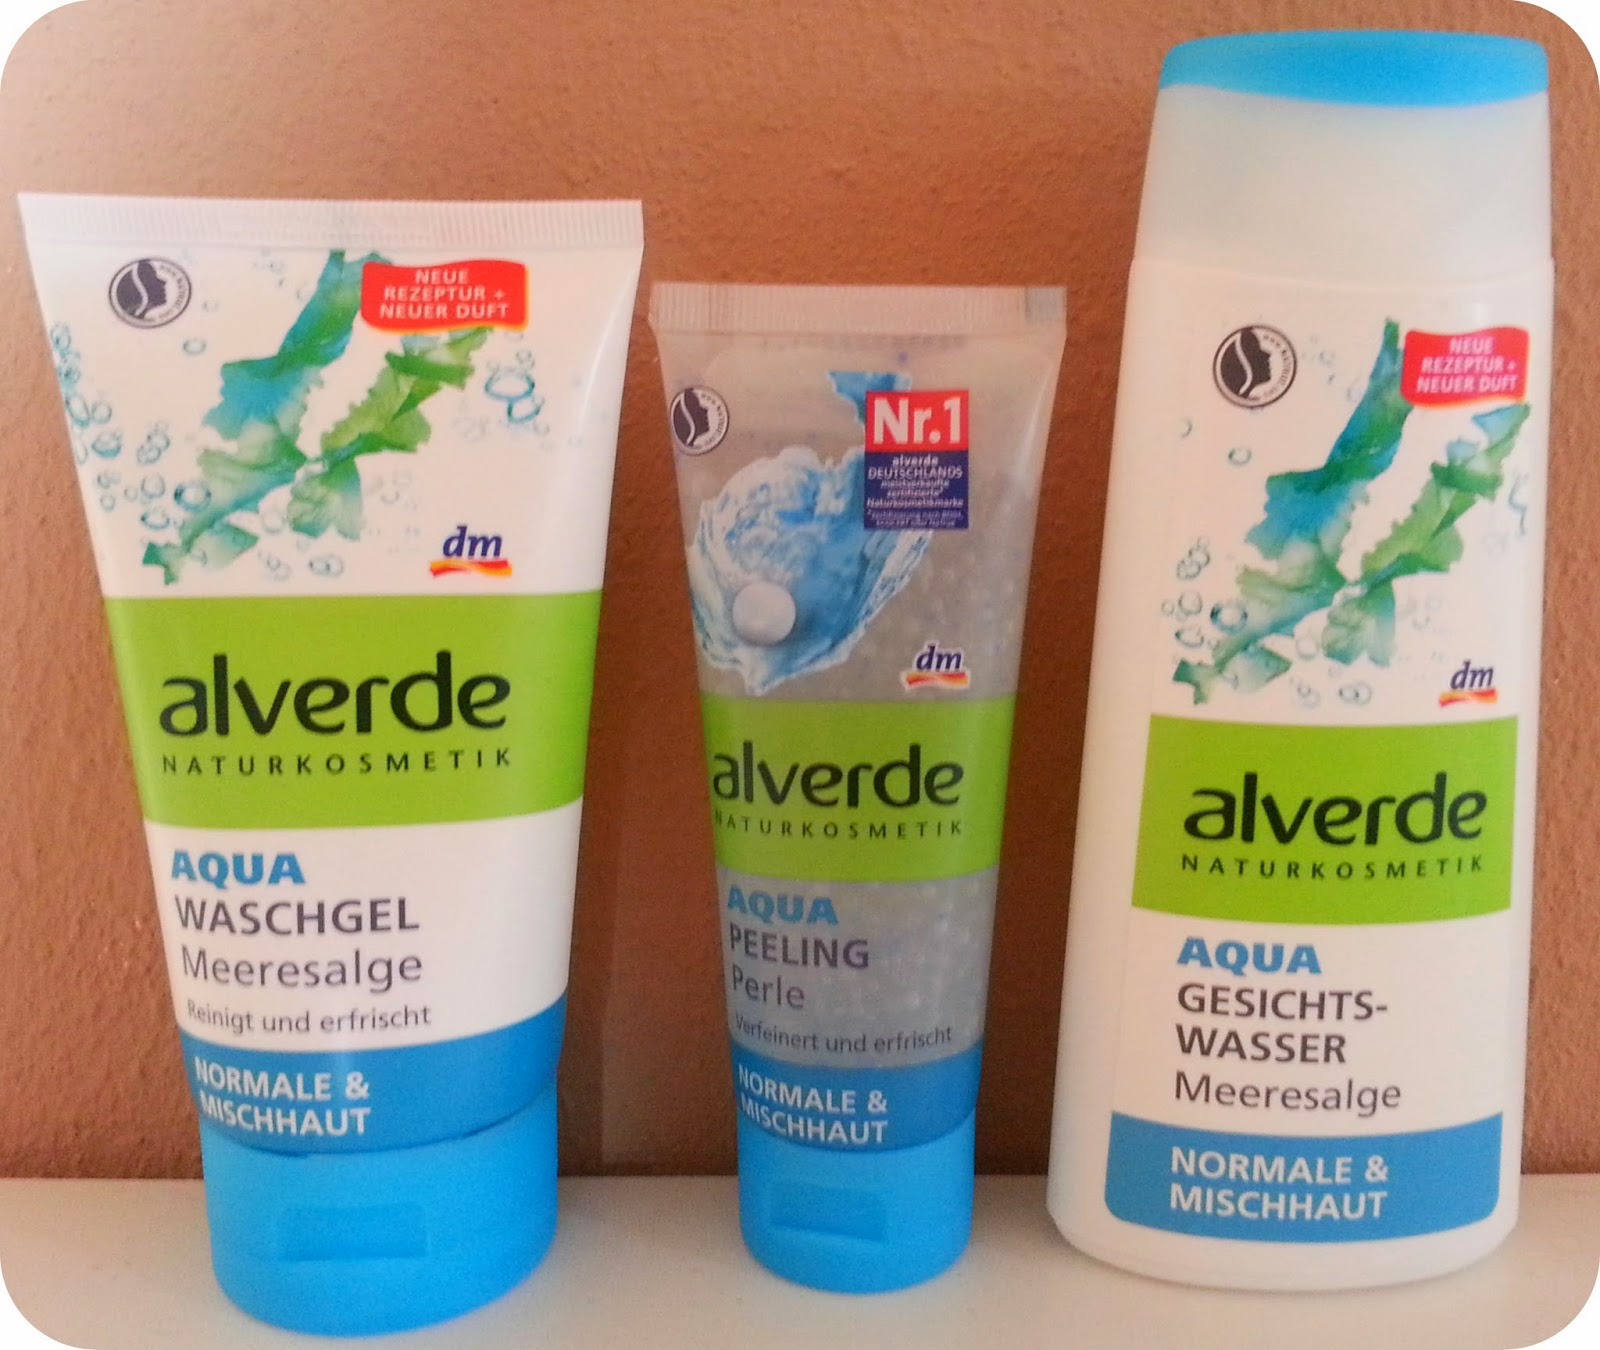 [Produkttest Nr.1] Alverde Aqua Serie mit Meeresalge